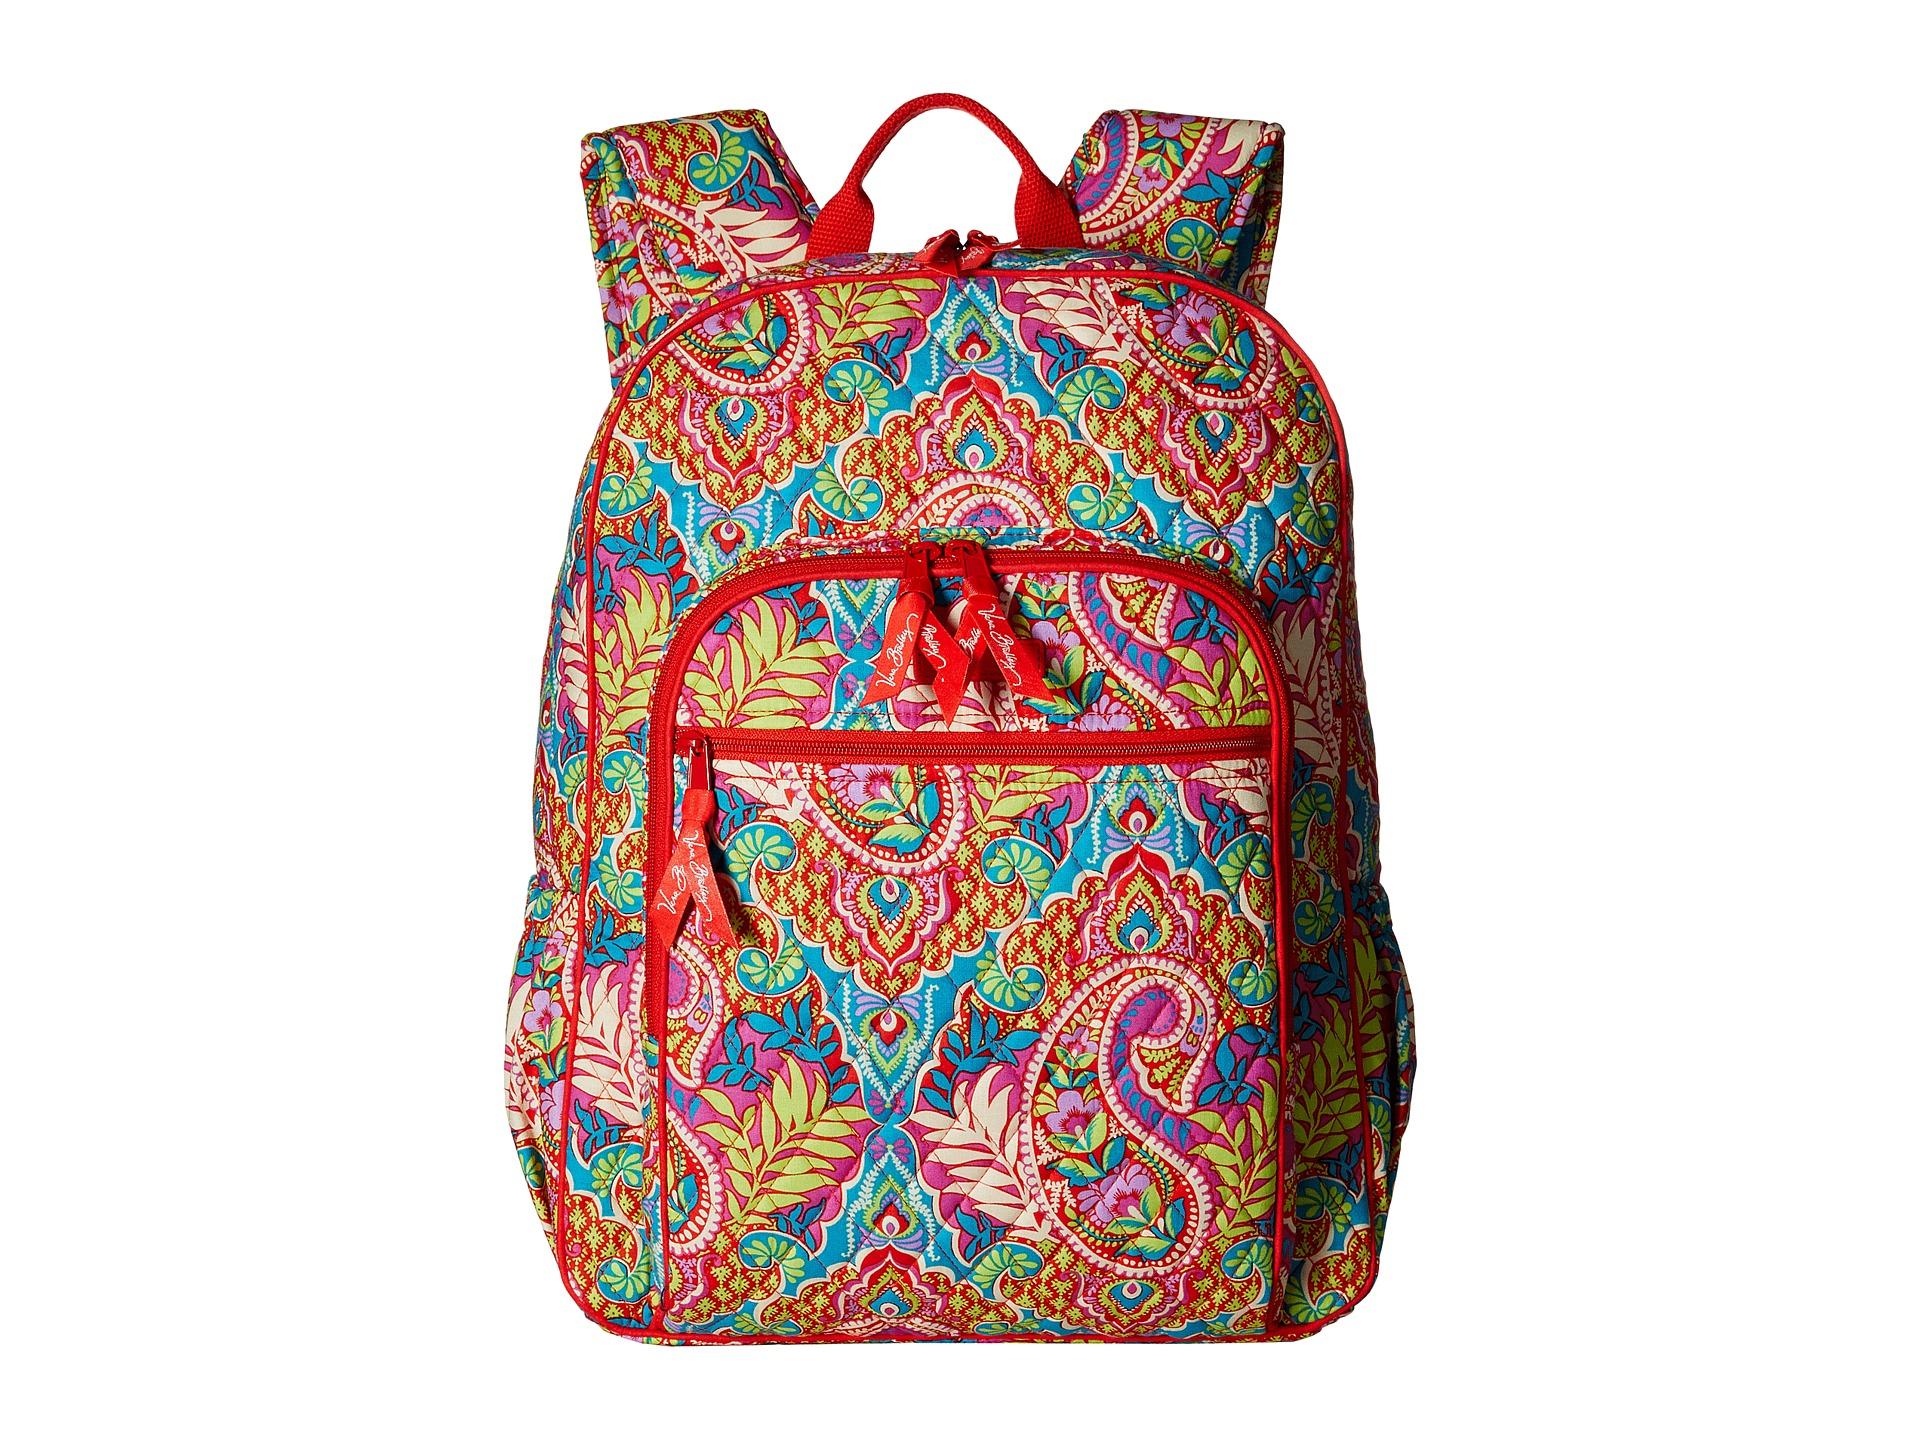 9c8f12c3a1e2 Lyst - Vera Bradley Campus Backpack in Red